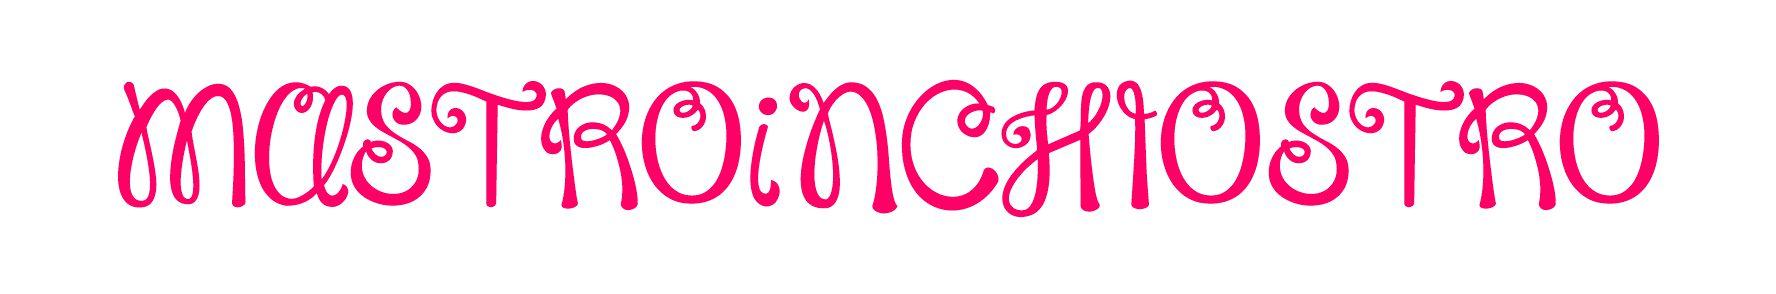 Hello Kitty font | MASTROiNCHIOSTRO